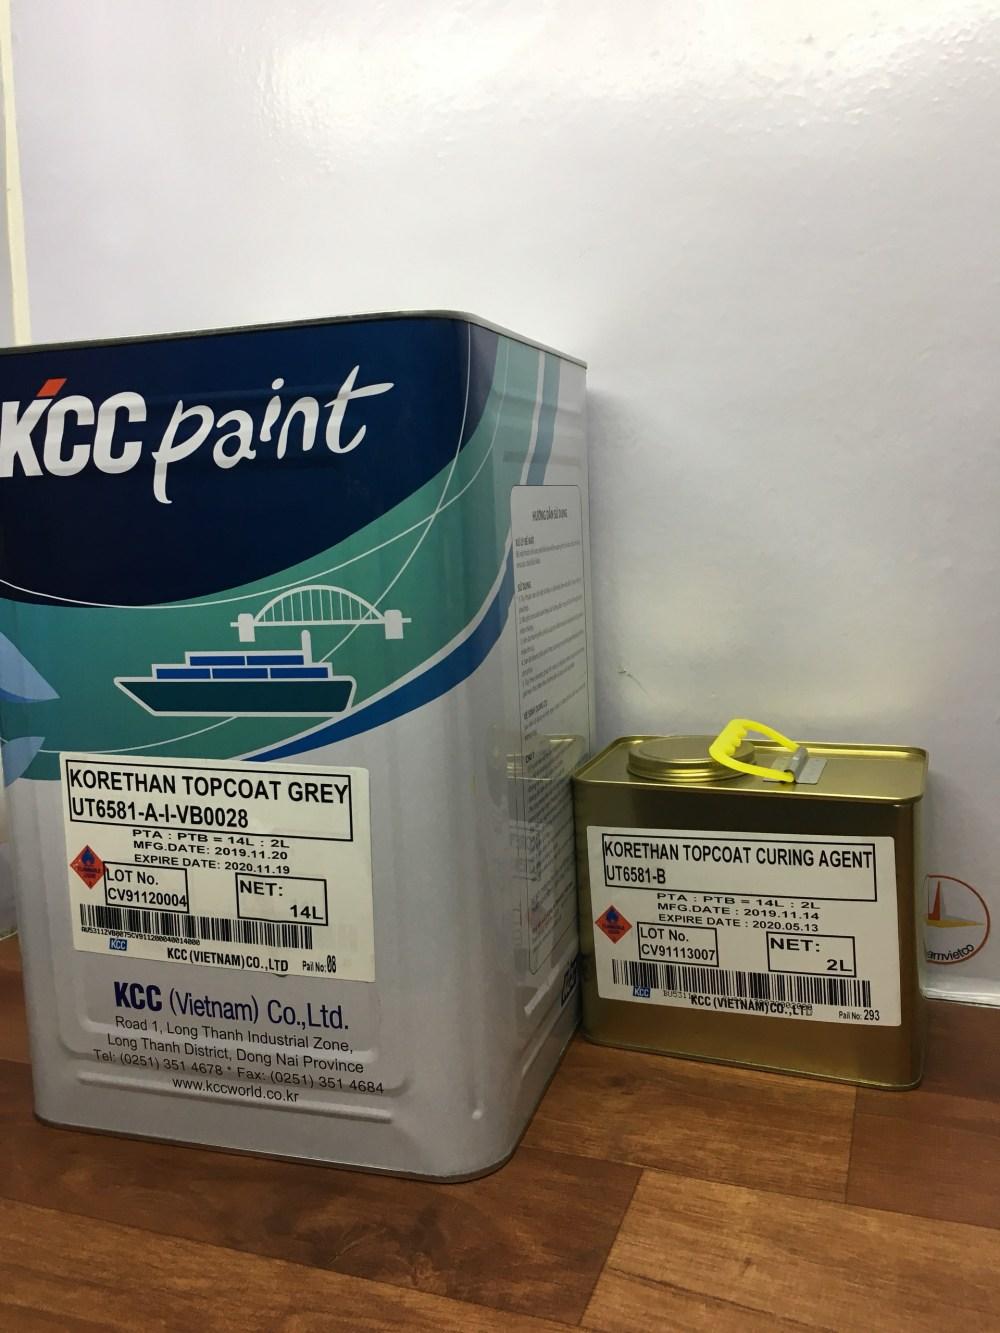 SON KCC KORETHAN TOPCOAT GREY UT6581-A-I-VB0028 -16L-BO (1)